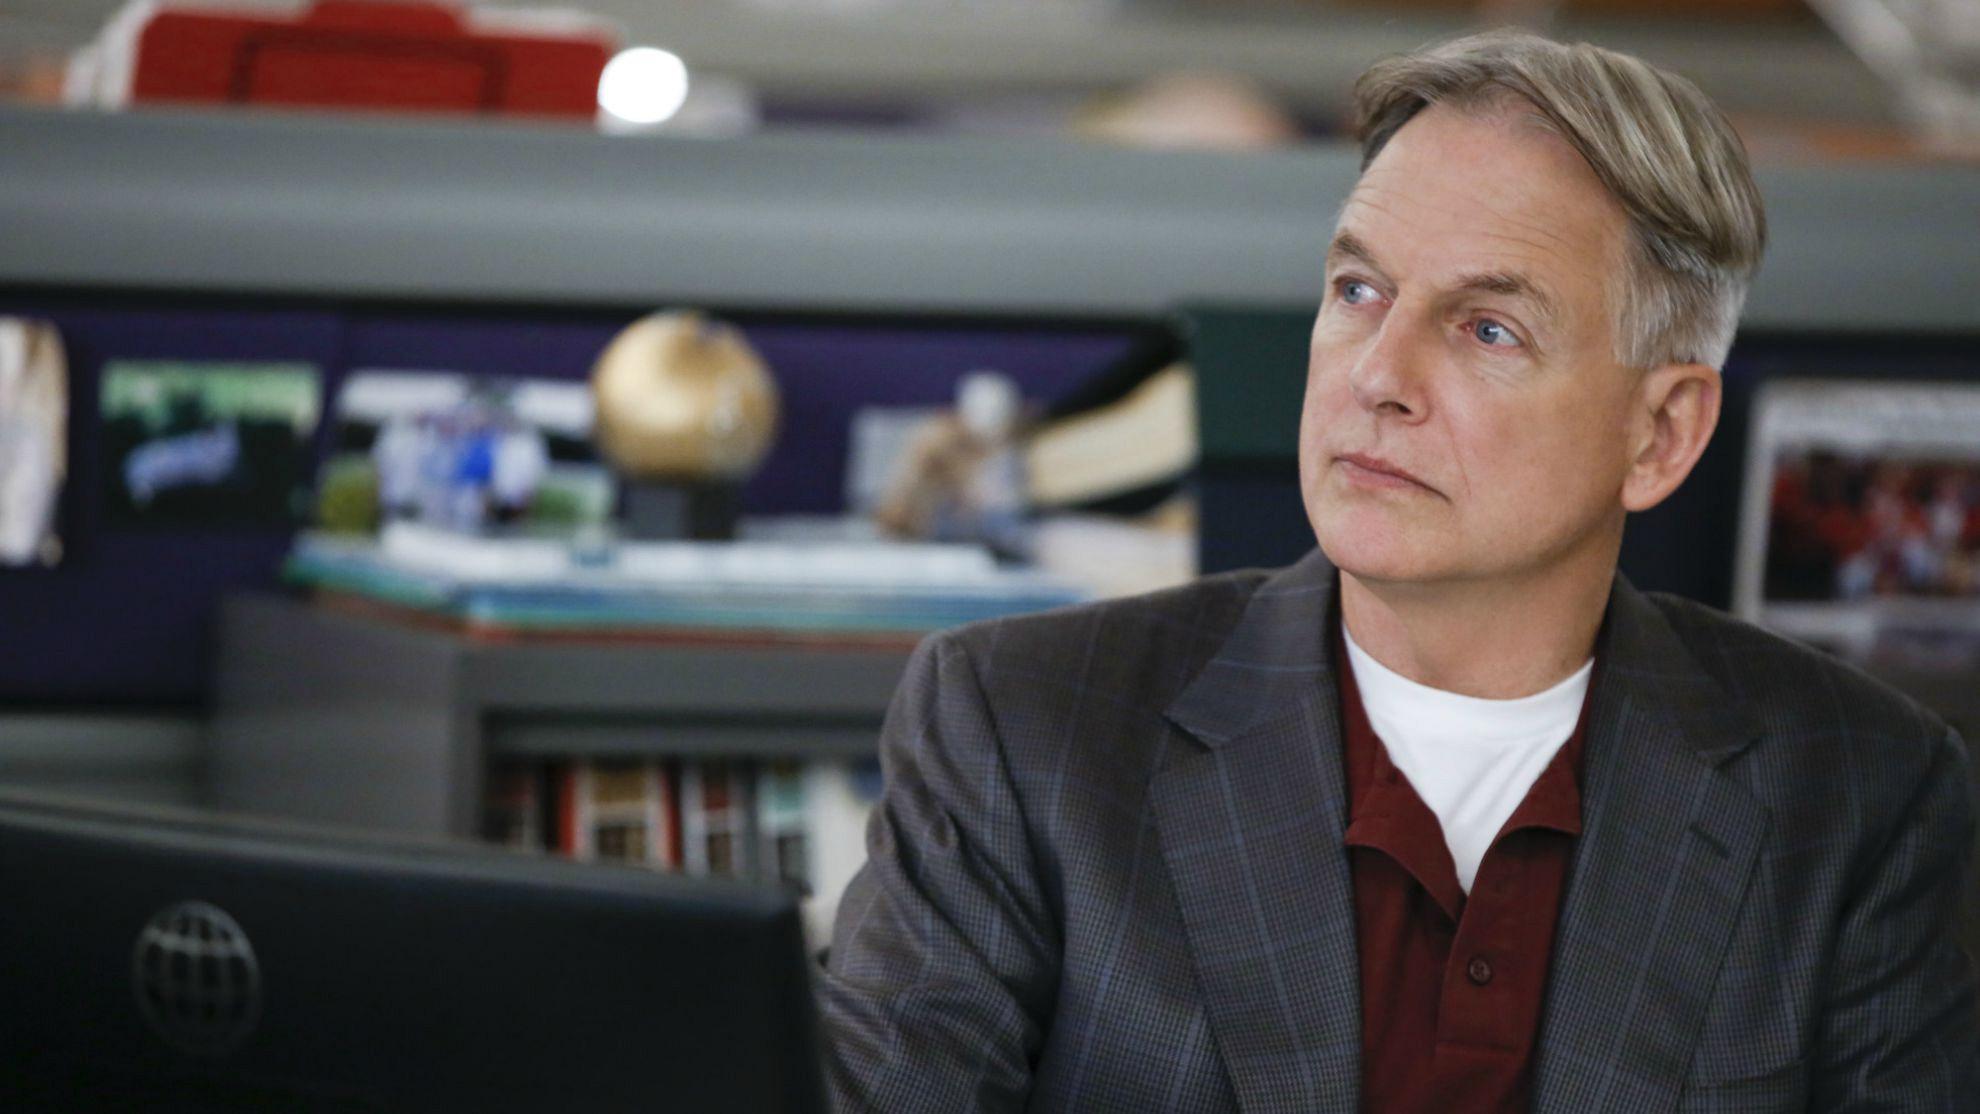 Special Agent Leroy Jethro Gibbs on NCIS